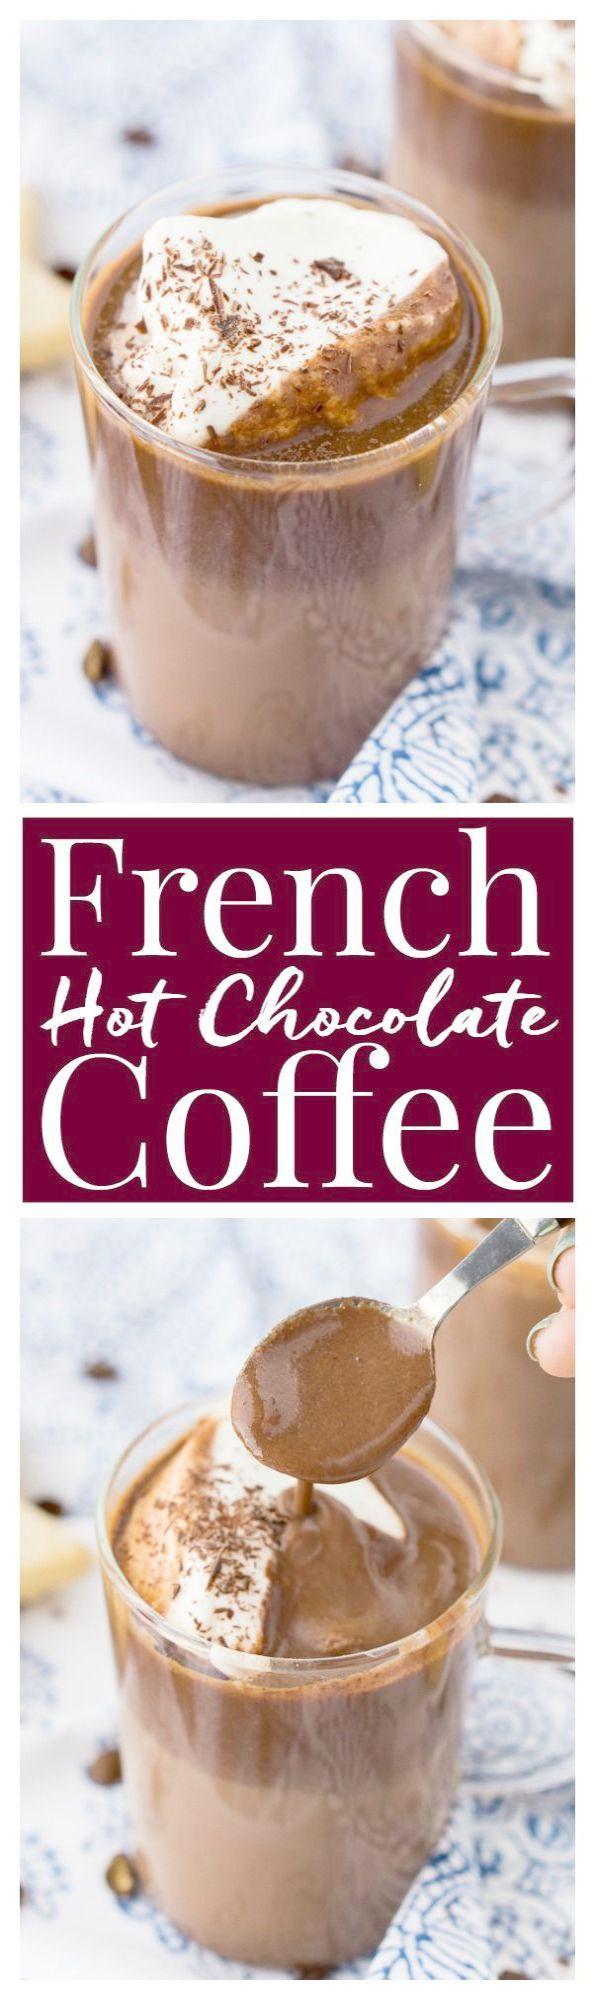 Coffee Drink Liqueur Recipes Upon Coffee Ground Emesis With Coffee Near Me Austin Tx Time Coff Coffee Recipes Hot Hot Chocolate Coffee Chocolate Coffee Recipes